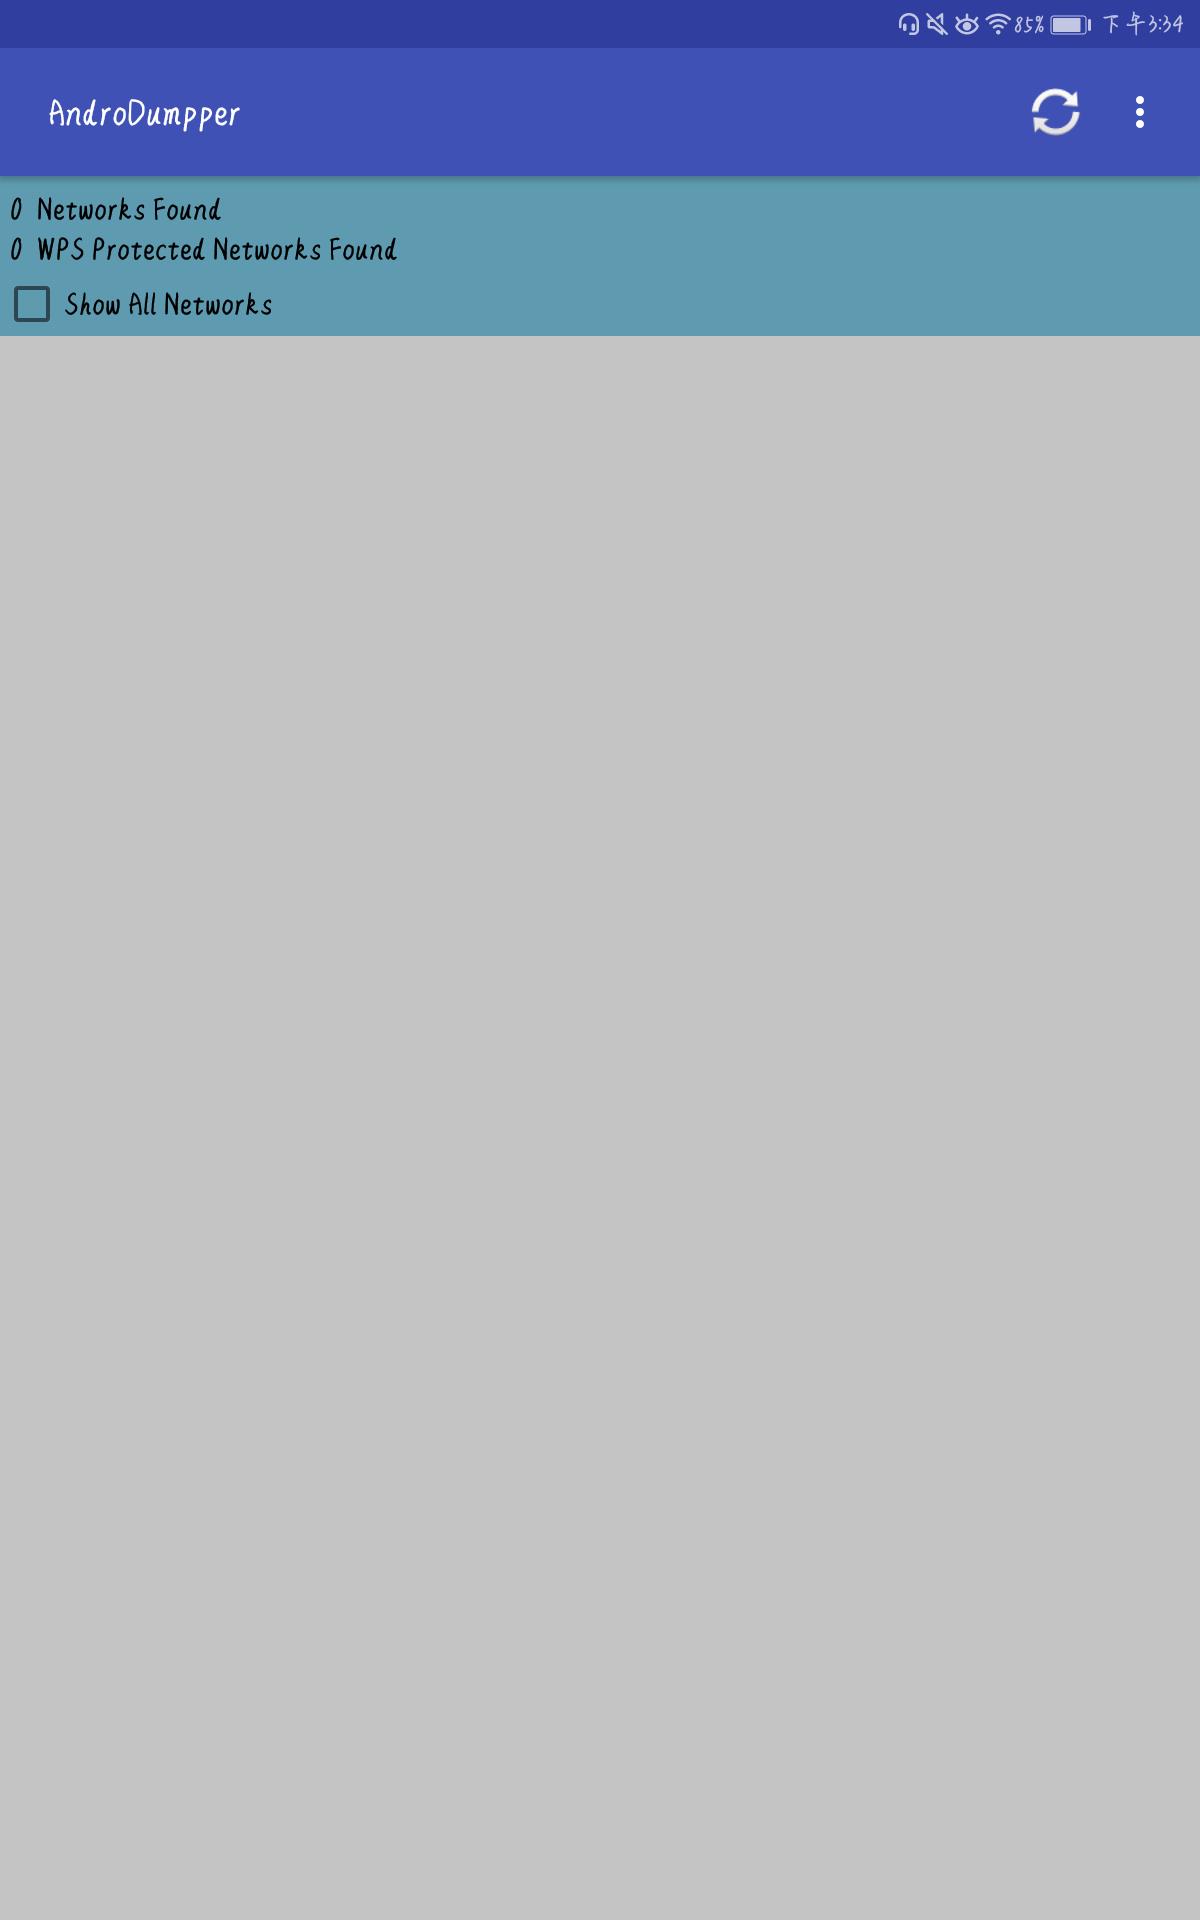 【考核】Andro Dumpper WiFi密码破解器v2.44